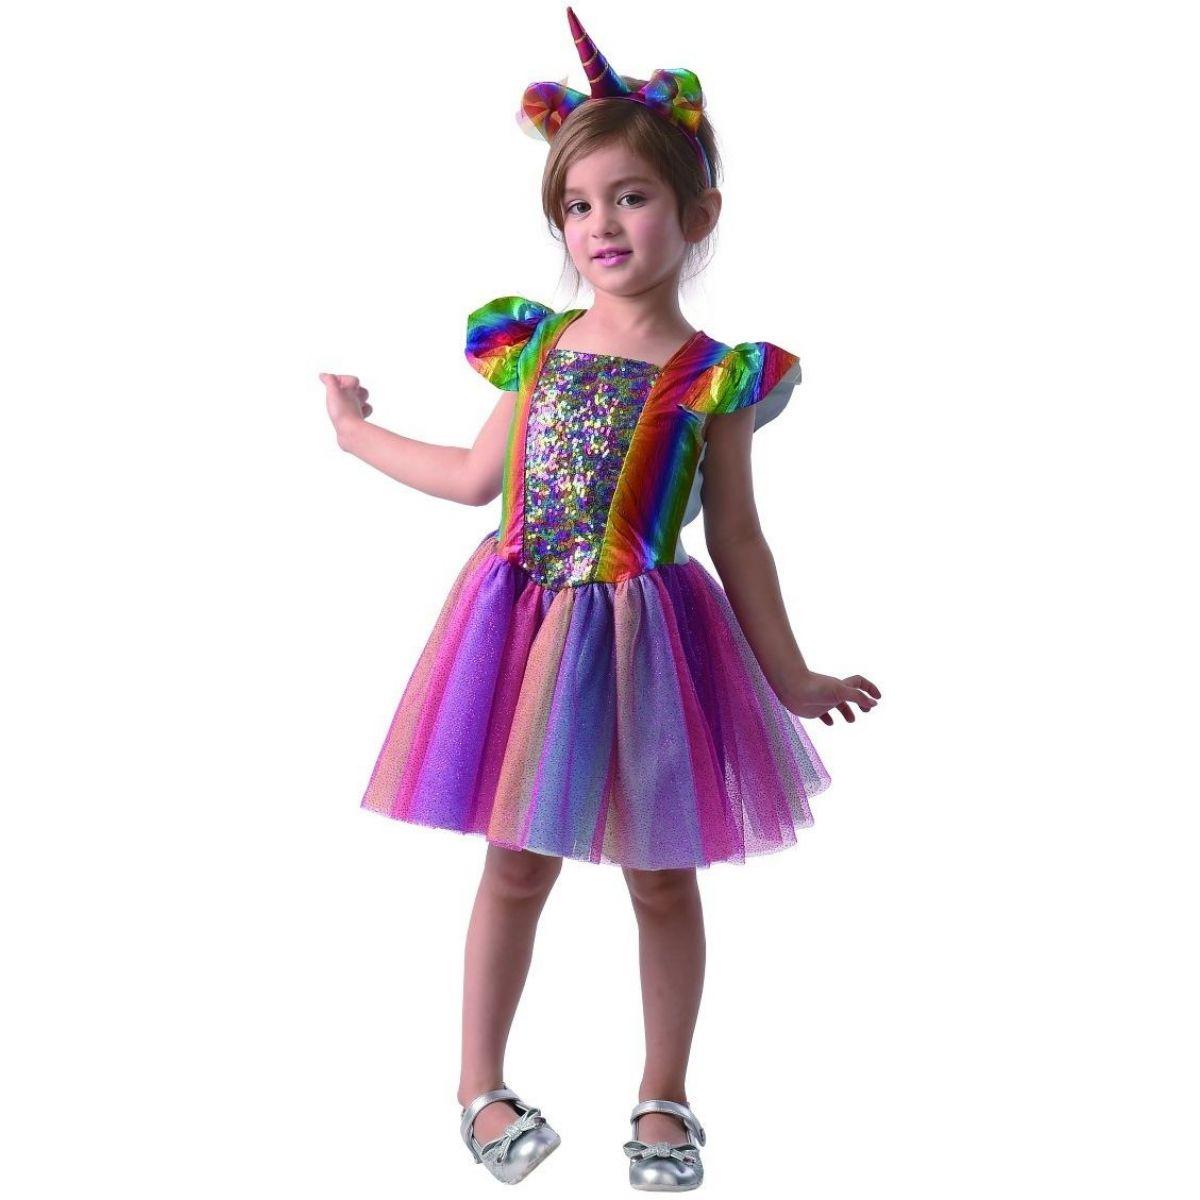 Šaty na karneval jednorožec 80 92 cm